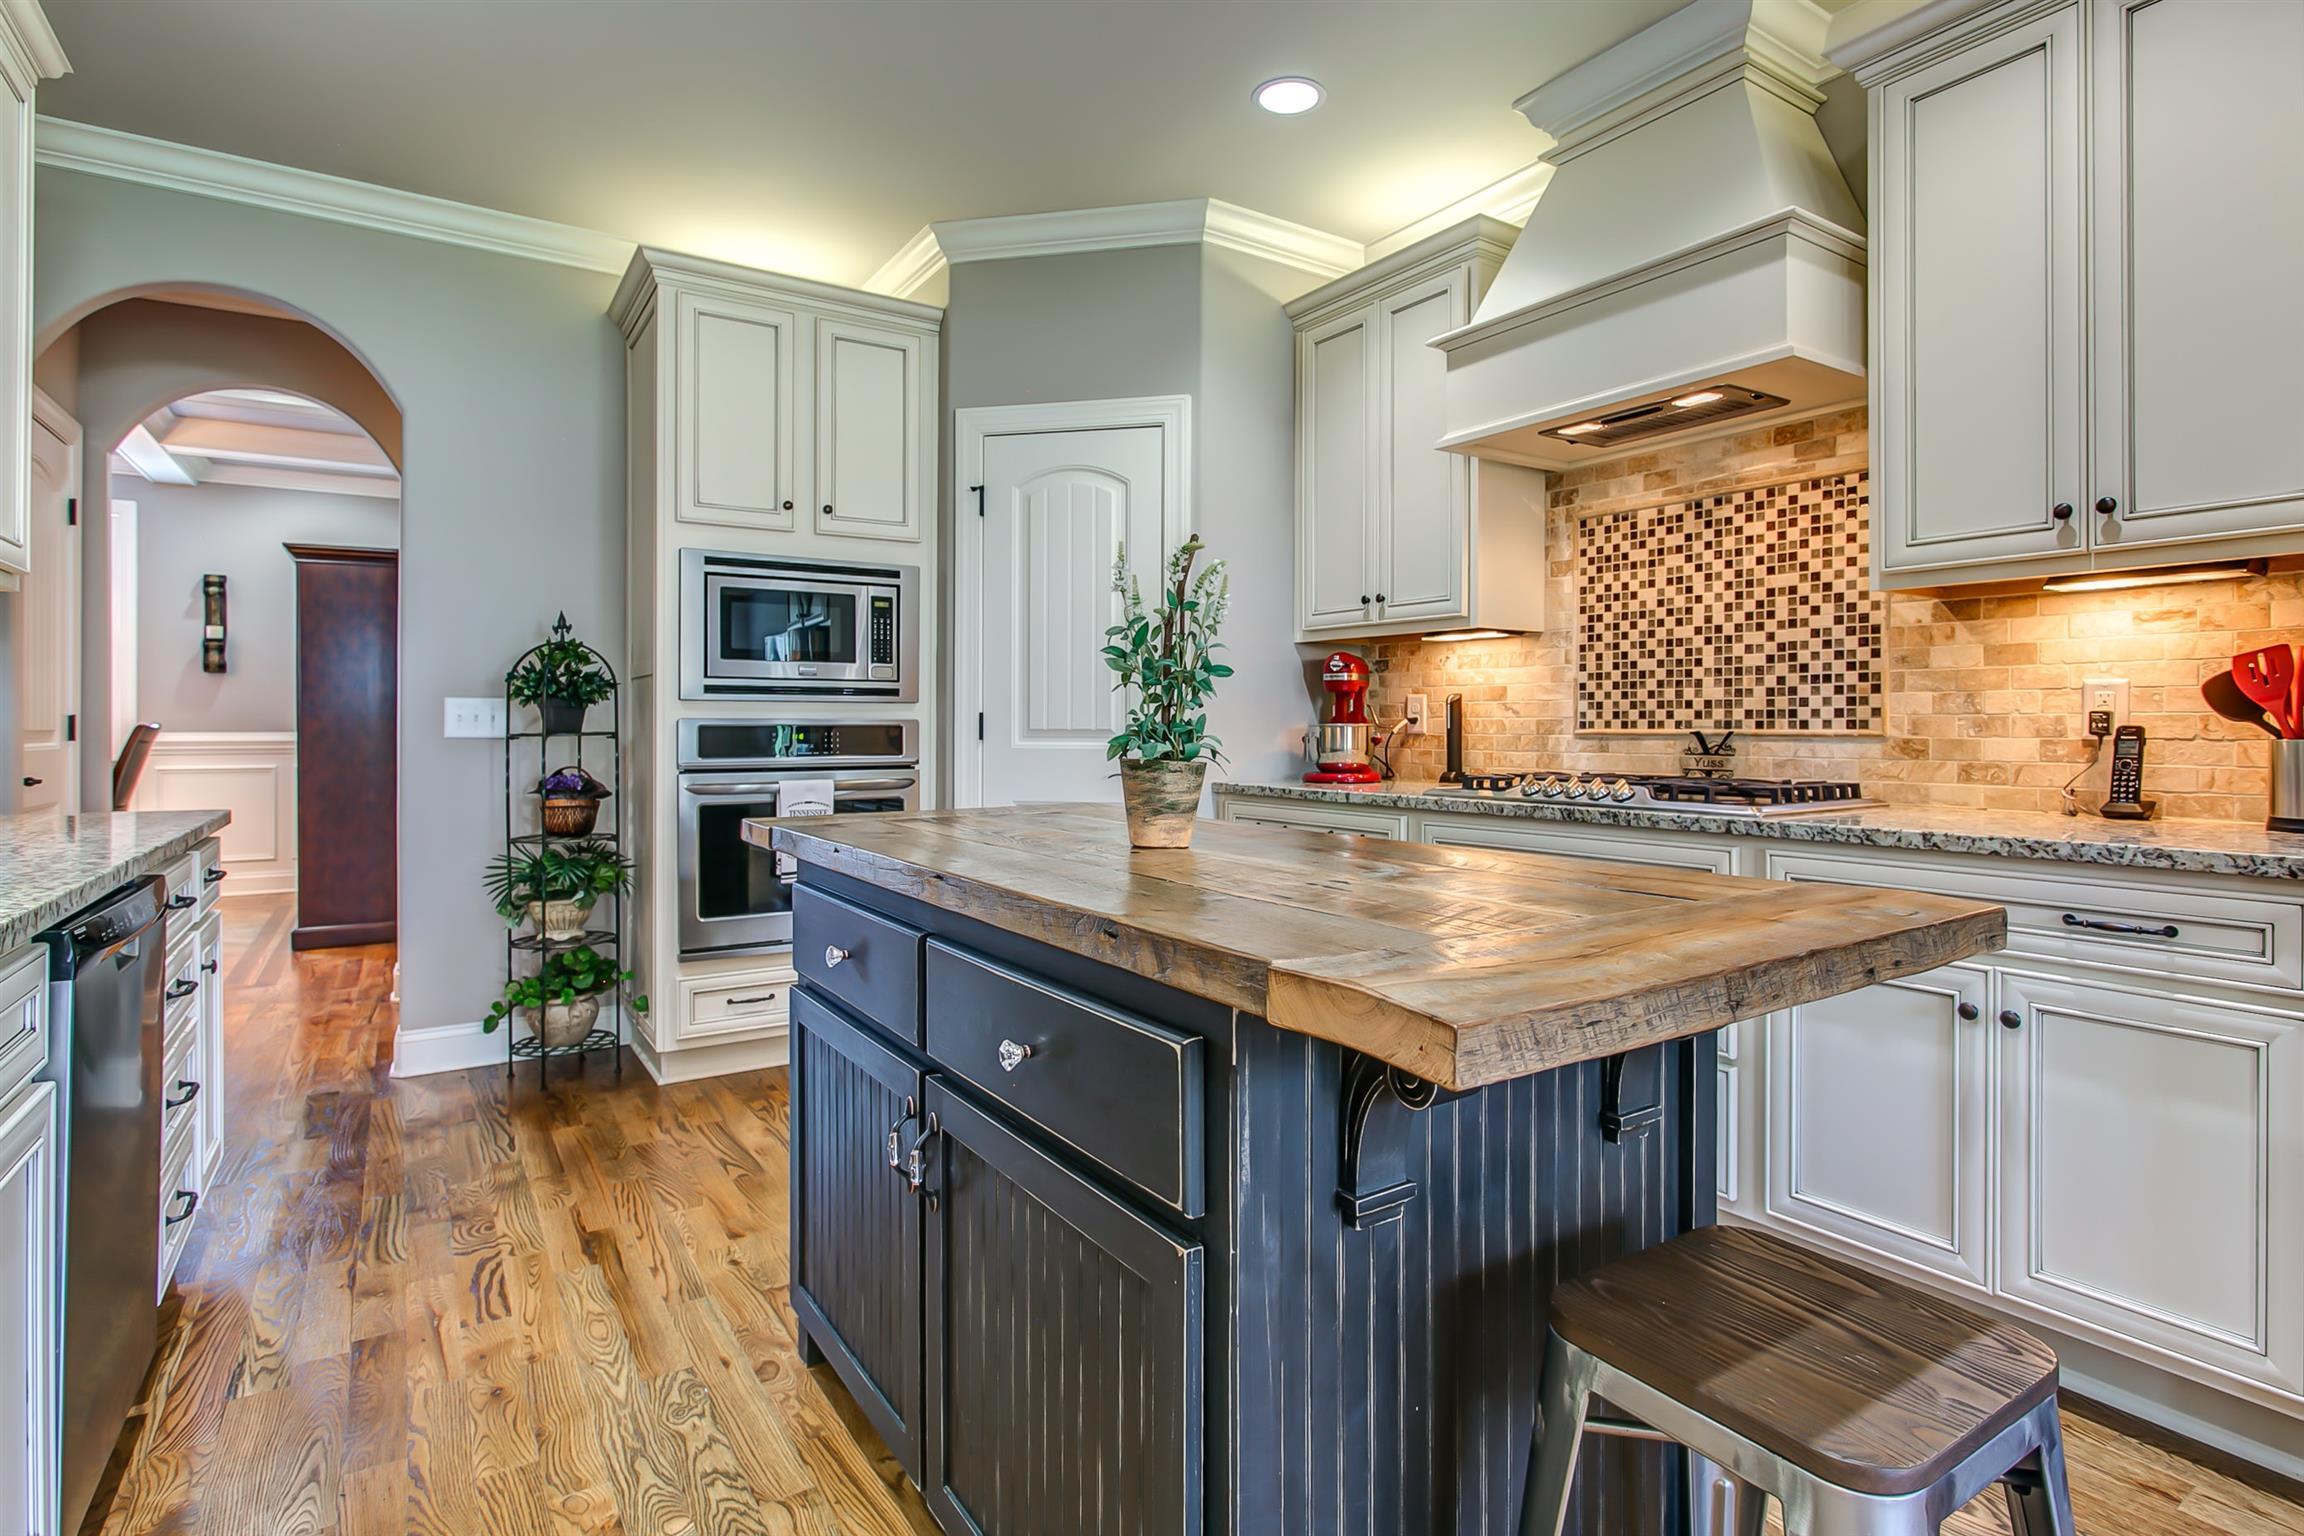 7009 Kidman Ln, Spring Hill, TN 37174 - Spring Hill, TN real estate listing